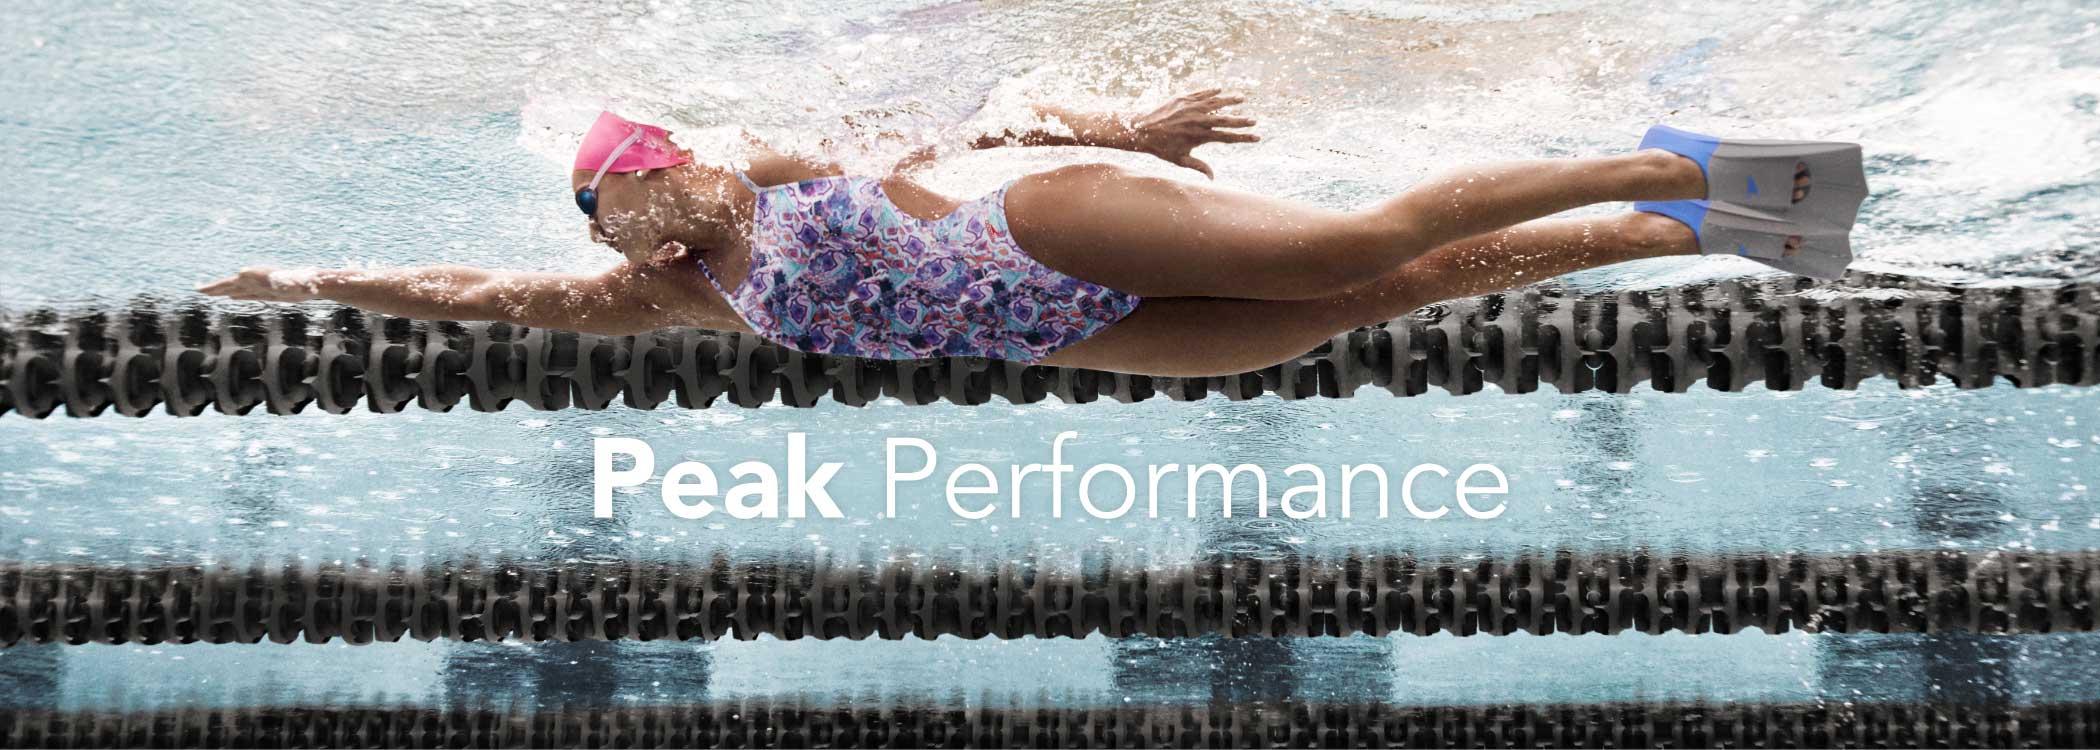 8c4dfde4a7a SwimOutlet.com - The Web s Most Popular Swim Shop! Women s Swimwear ...